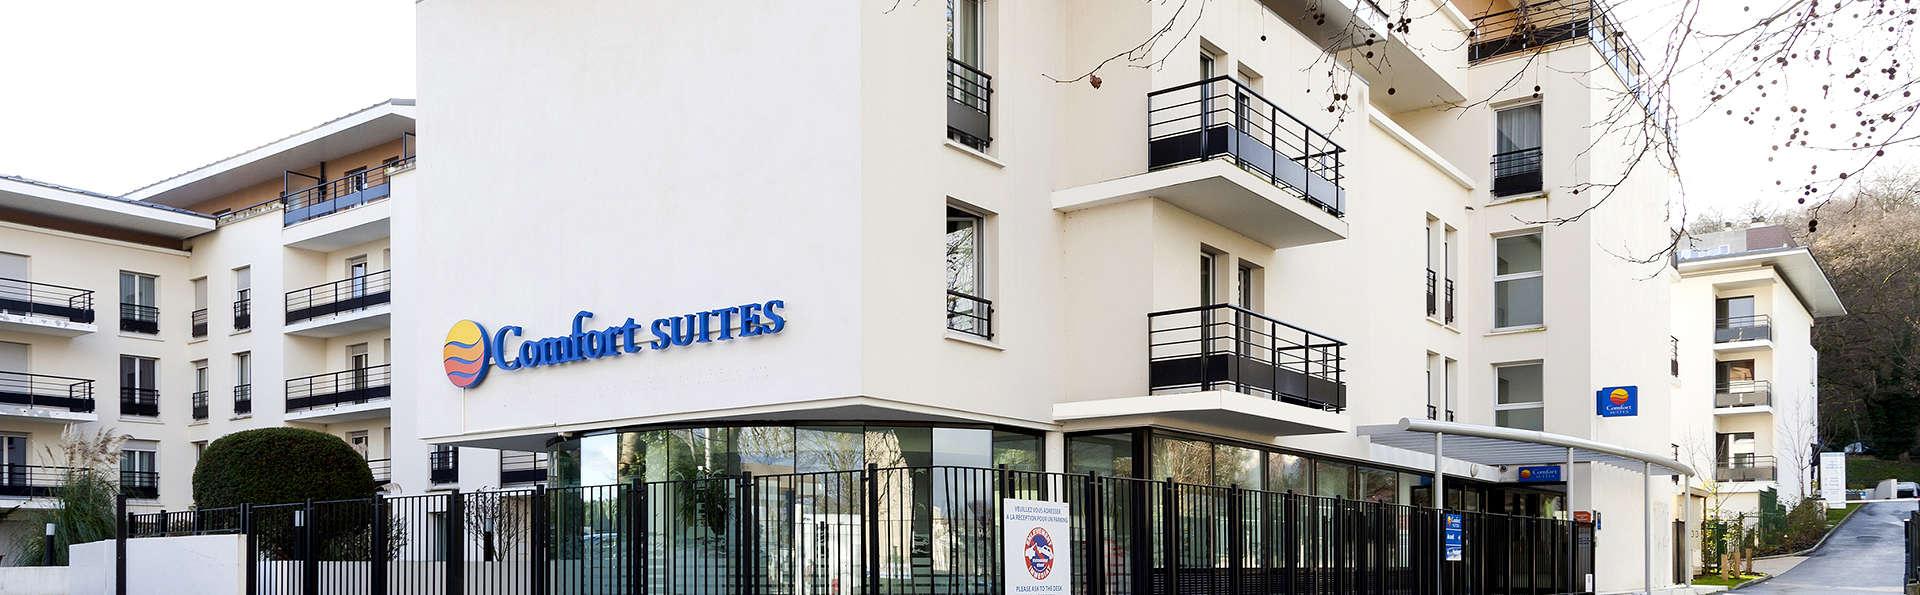 Comfort Suites Le Port Marly 3